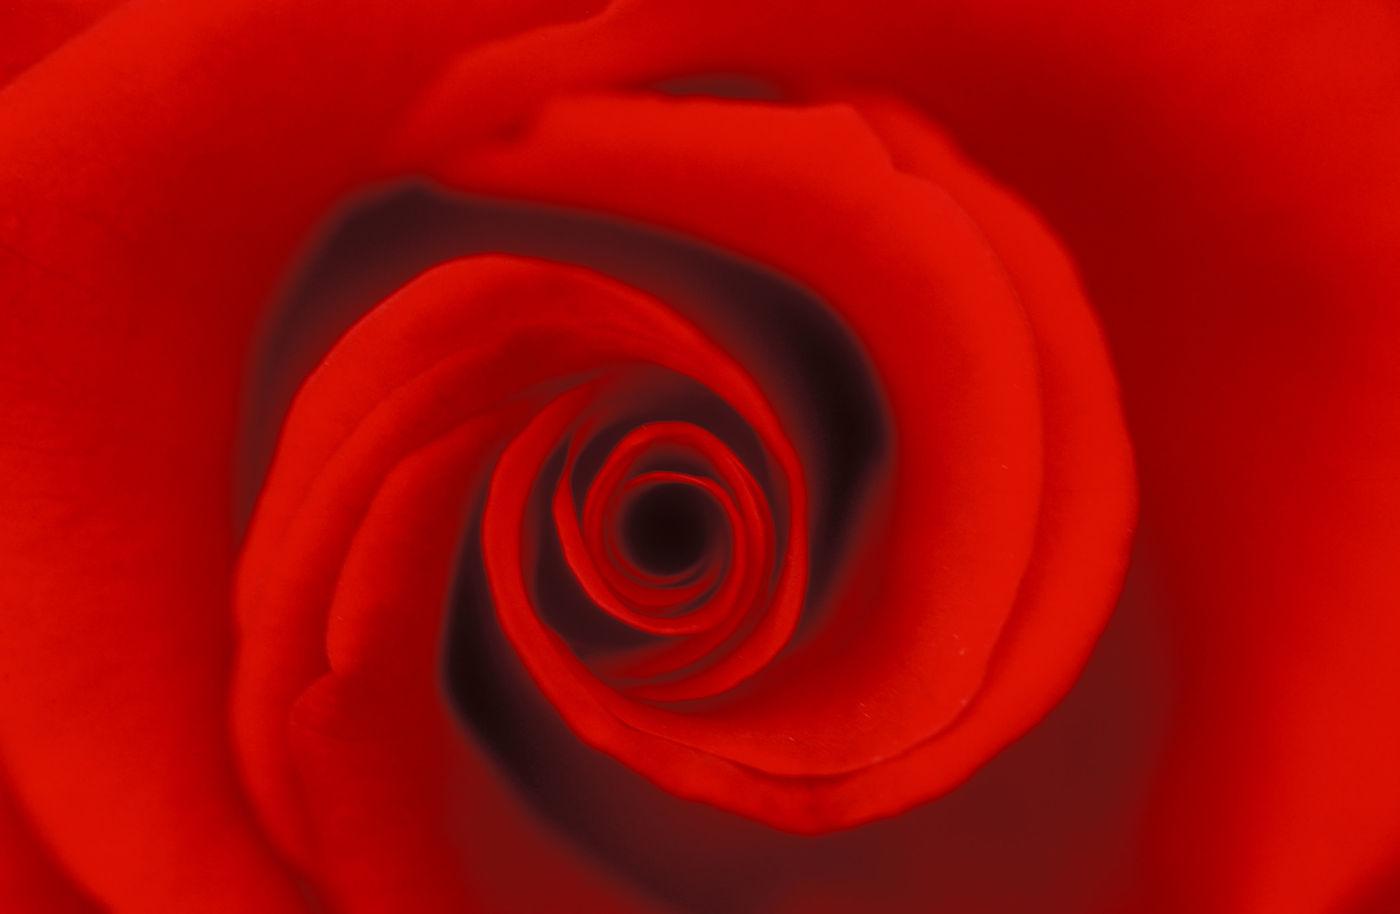 fibonacci spiral how to draw